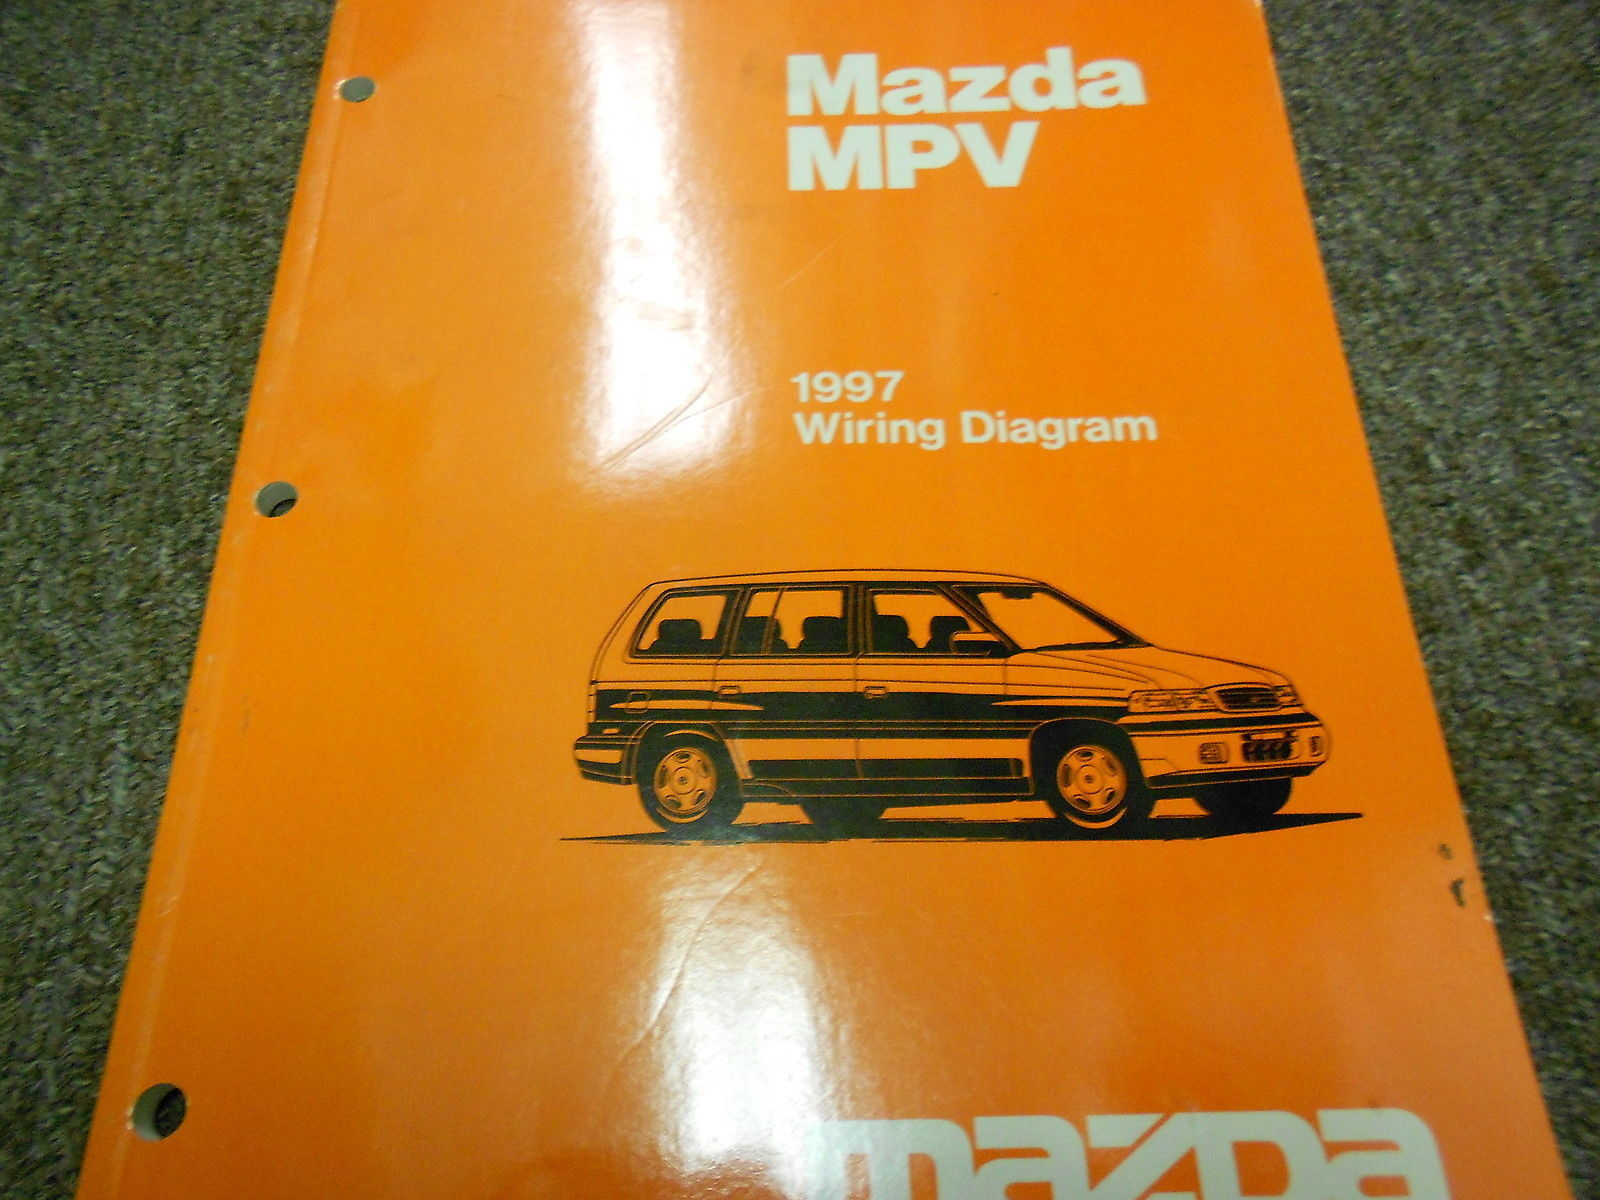 hight resolution of 1997 mazda mpv van electrical wiring diagram service repair shop manual 97 17 77